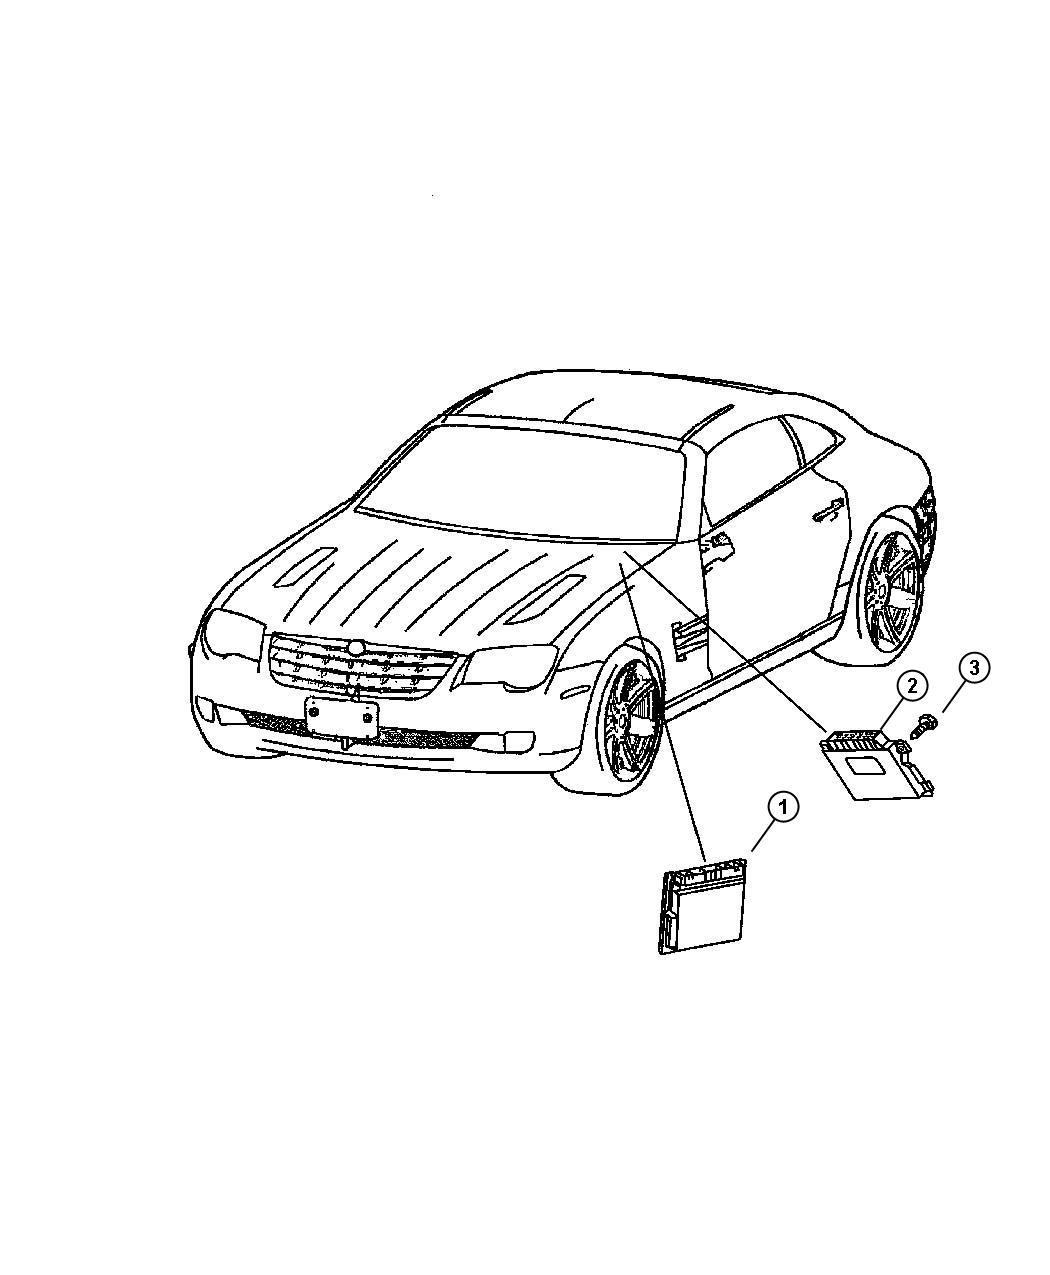 Chrysler Crossfire Module Powertrain Control Build To U S Market Specifications